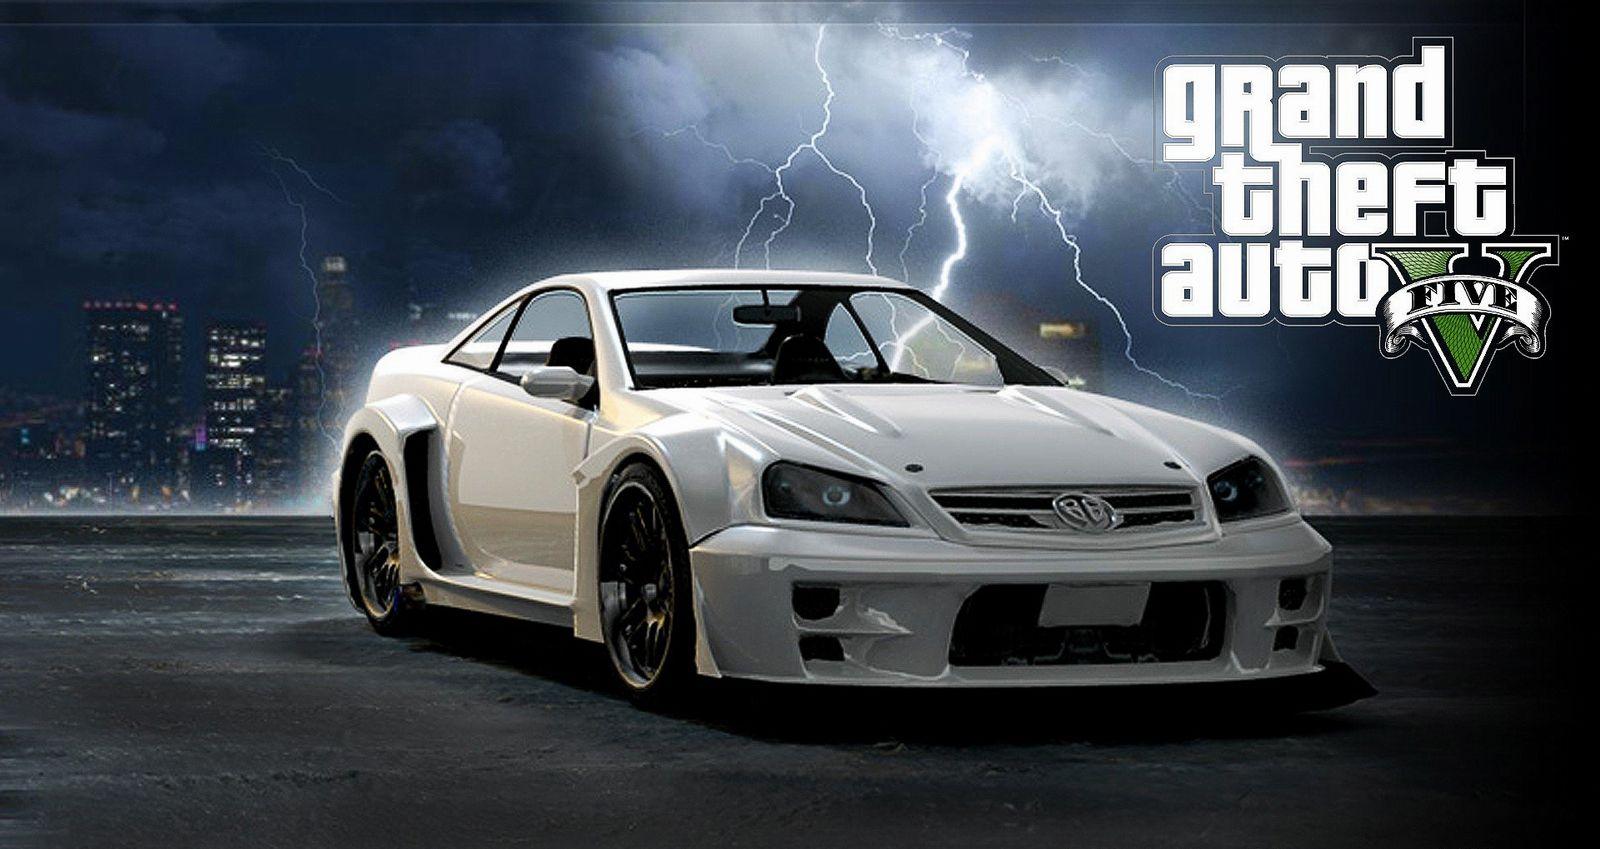 Gta 5 Car Wallpaper High Resolution Is Cool Wallpapers - Gta V Cars Mercedes , HD Wallpaper & Backgrounds